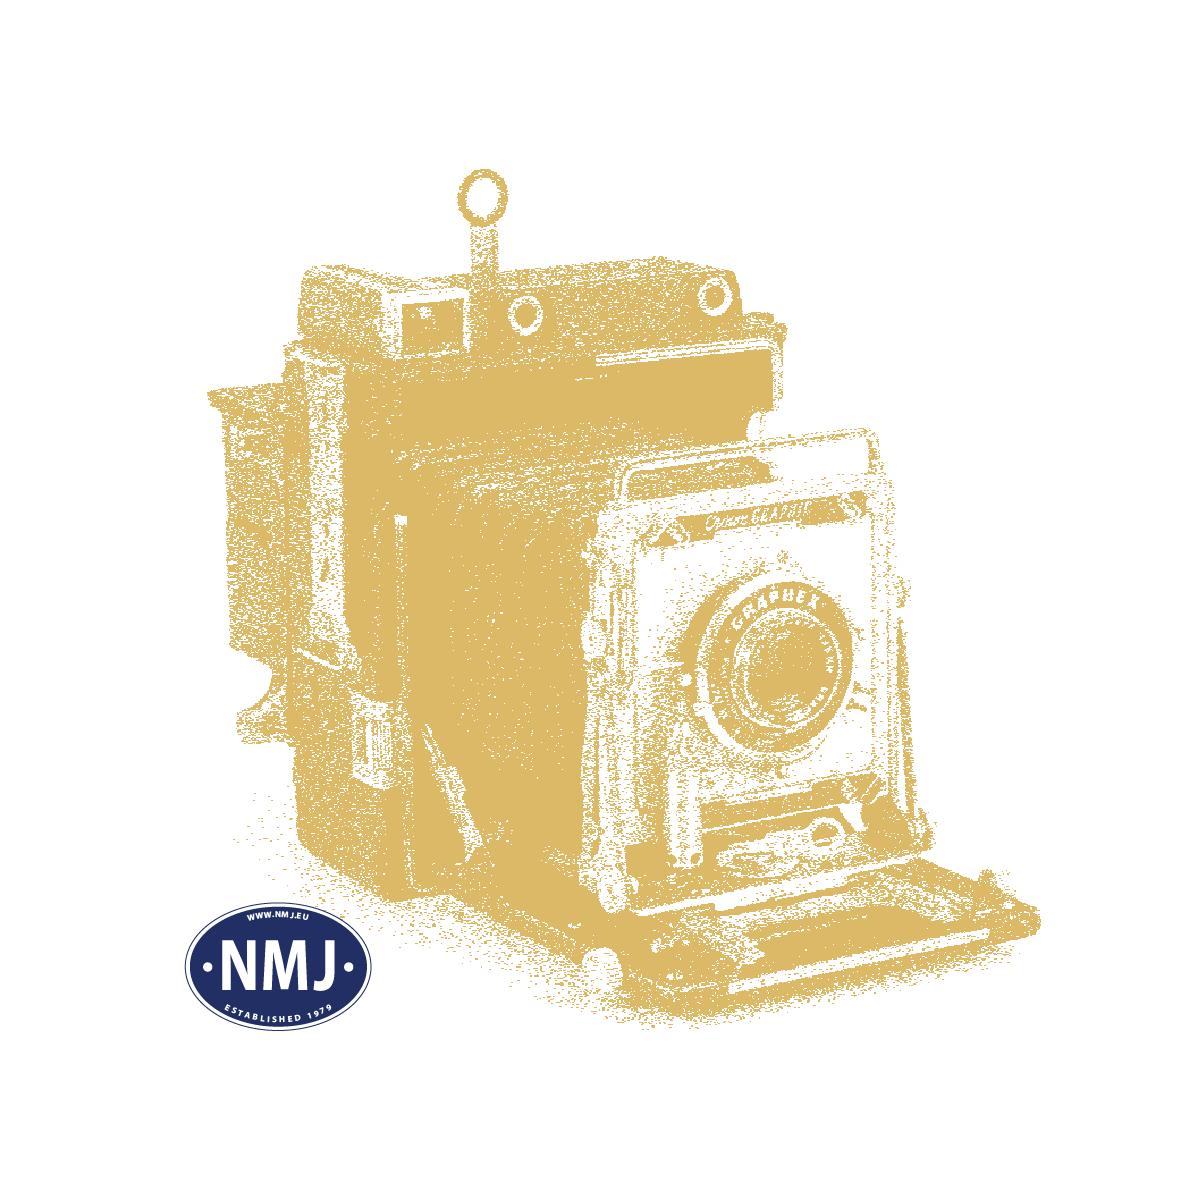 NMJT505.990 - NMJ Topline NSB/Finsam fliscontainere, 3 stk